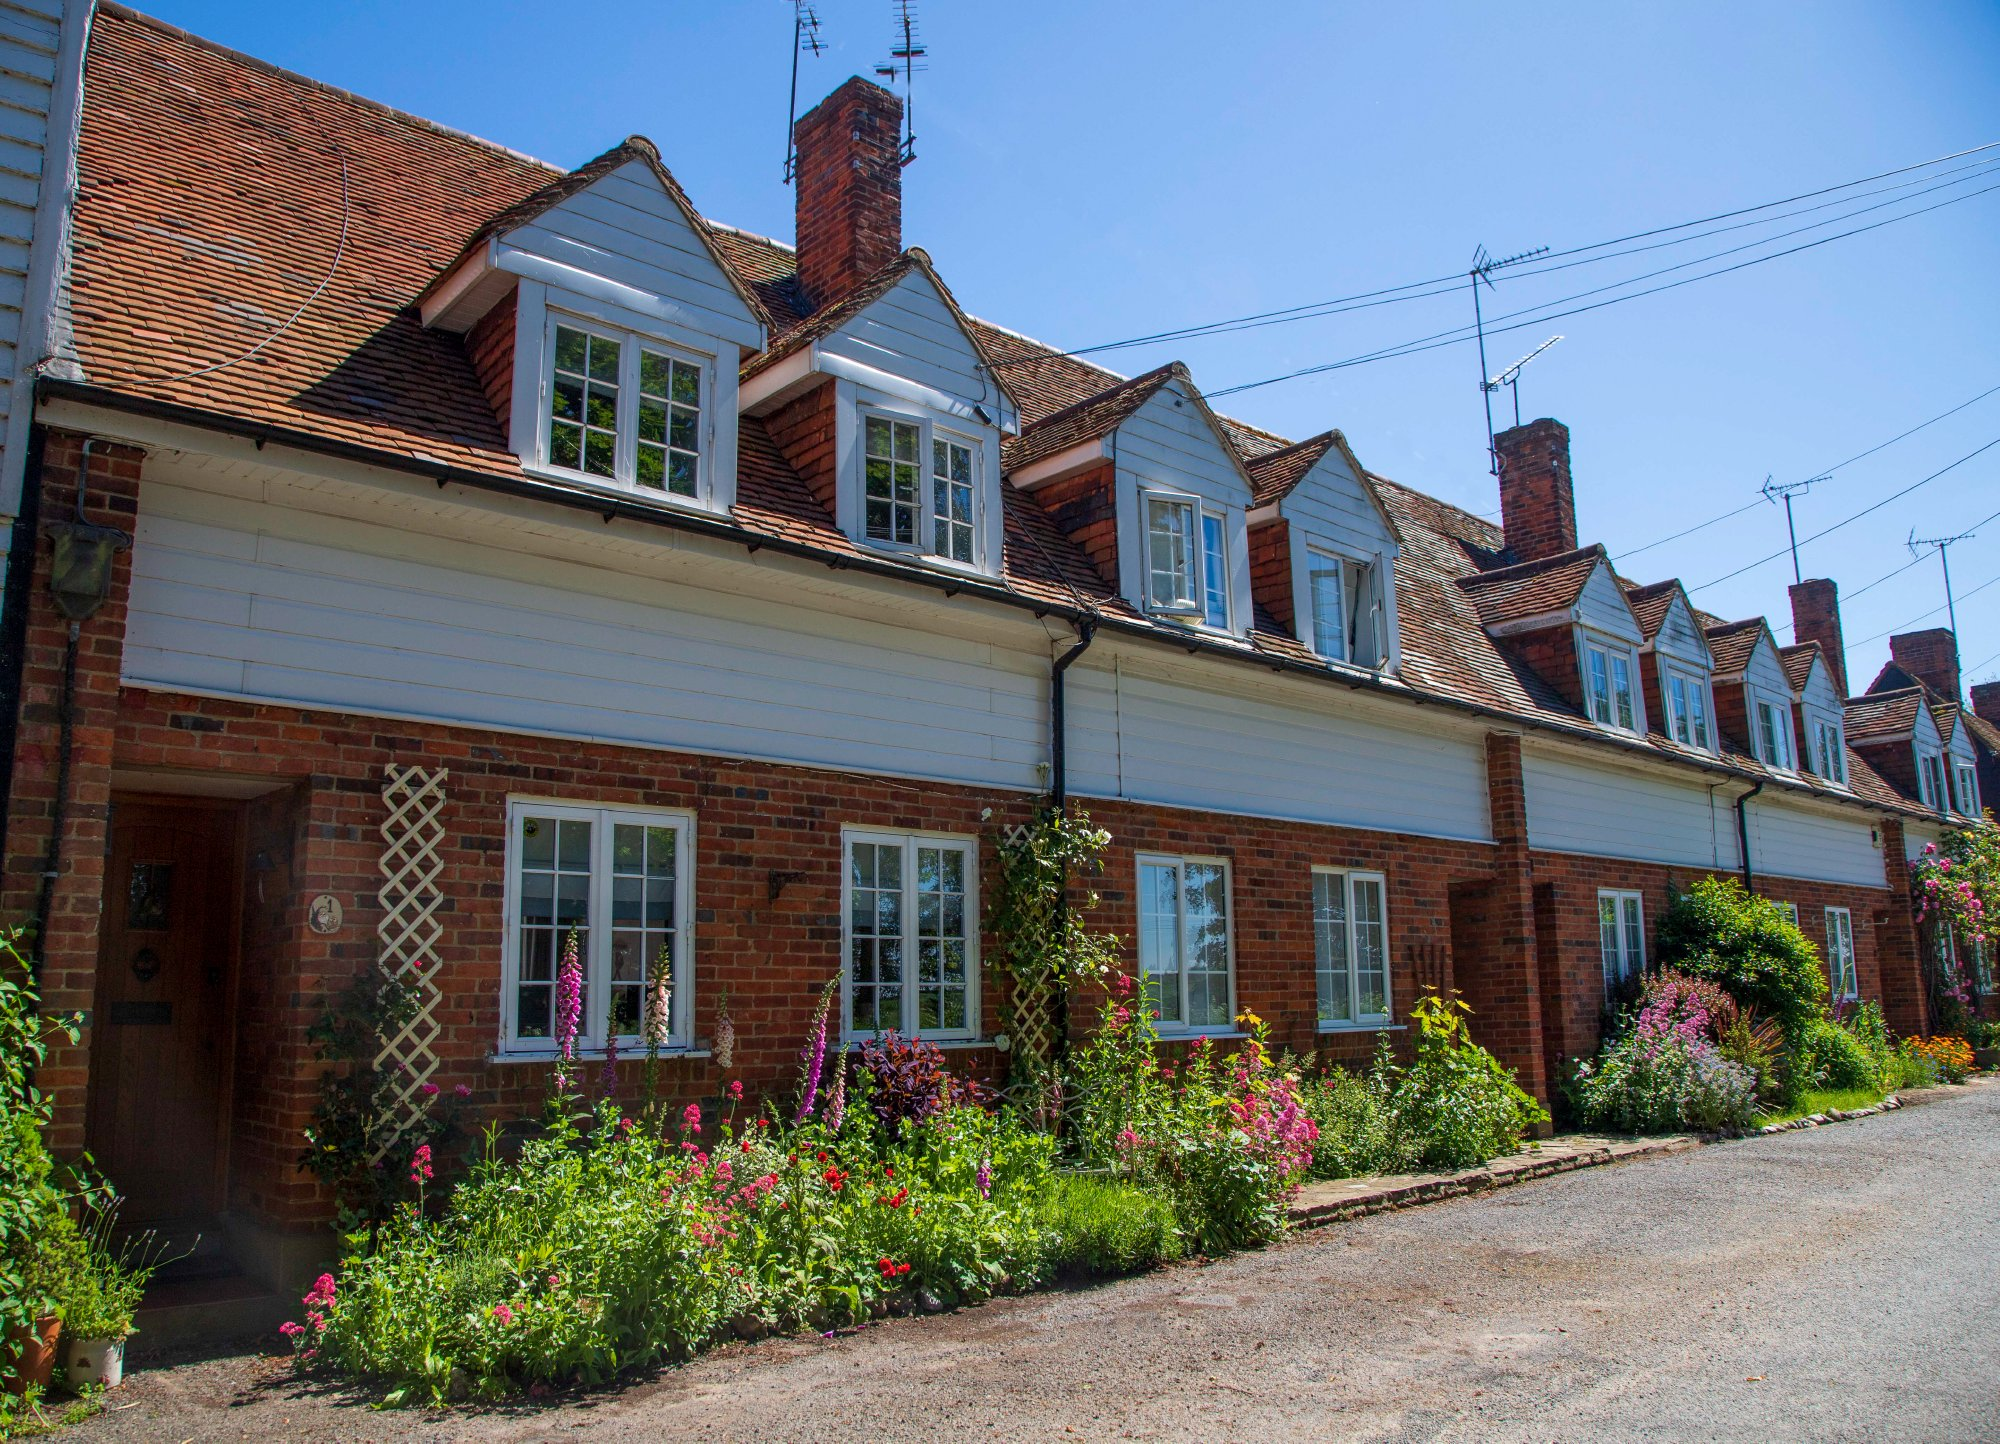 Punchbowl Cottages, Church End Paglesham, Rochford